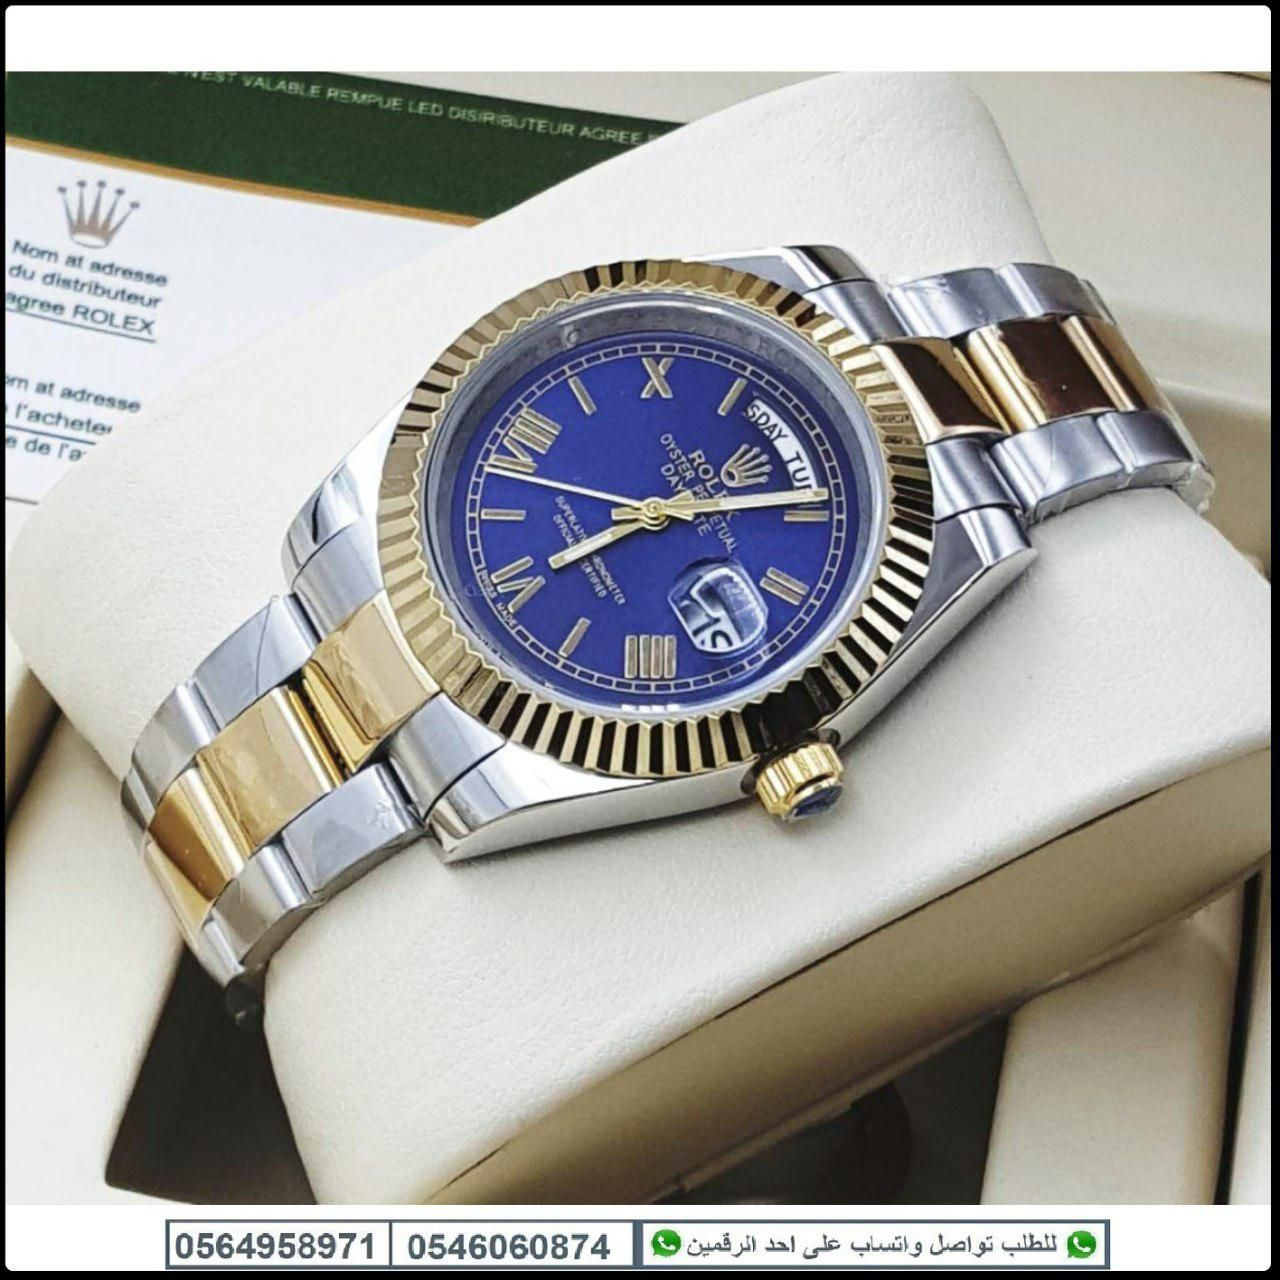 ساعات رولكس رجالي Rolex درجه اولى مع علبه مخمل هدايا هنوف Rolex Watches Omega Watch Watches